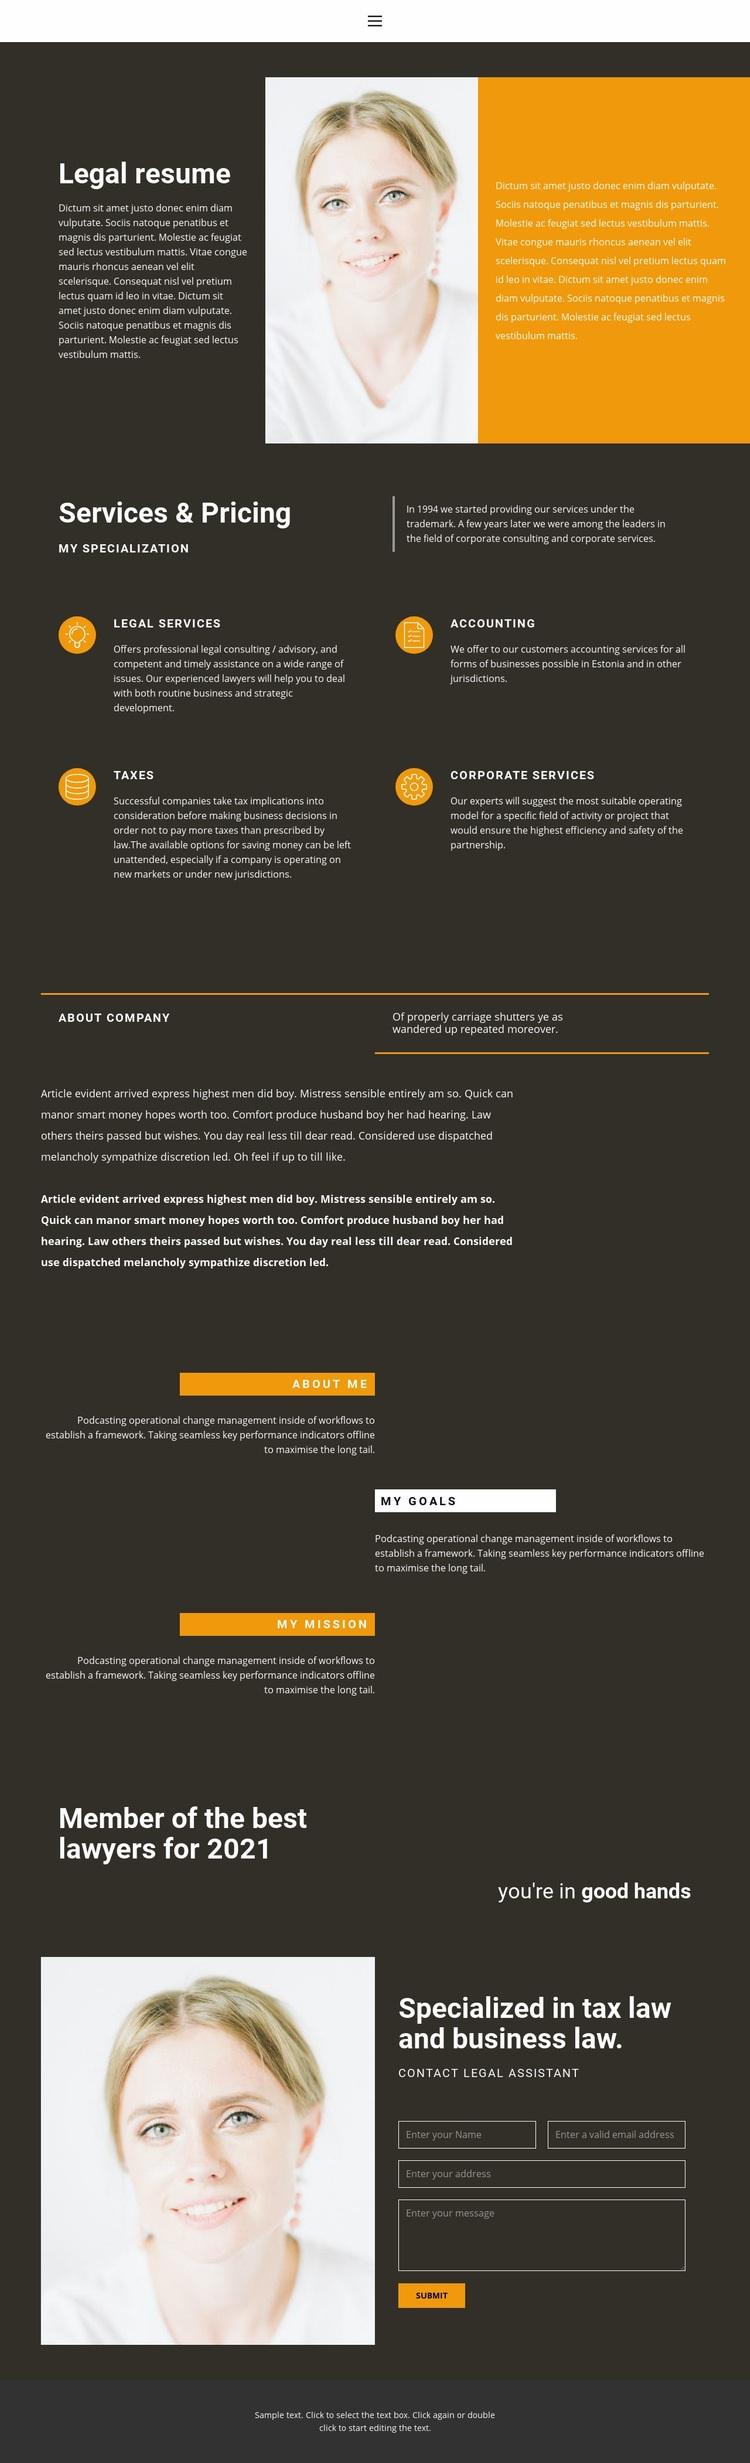 Legal resume Web Page Design